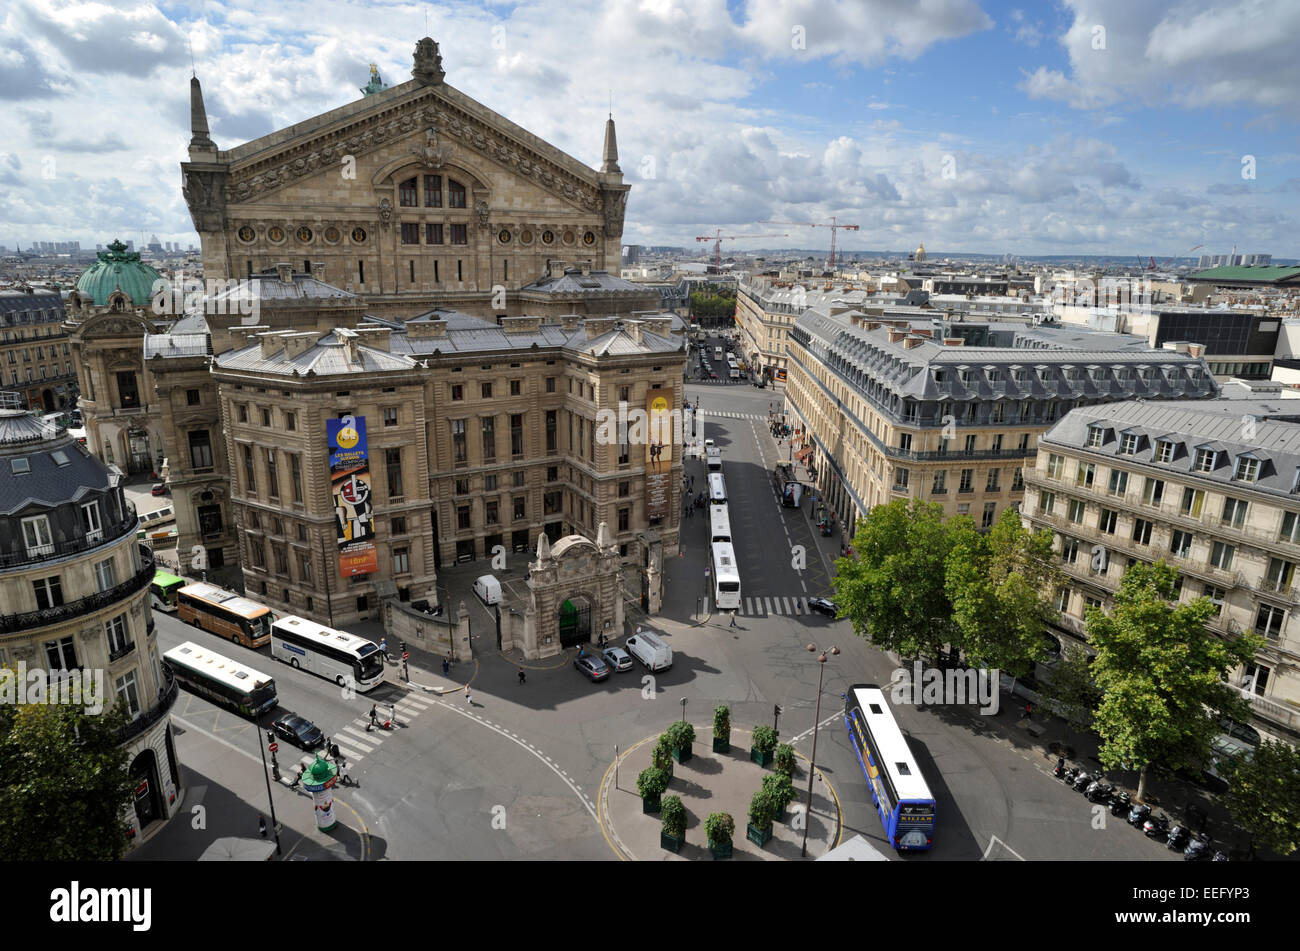 paris, opera garnier - Stock Image